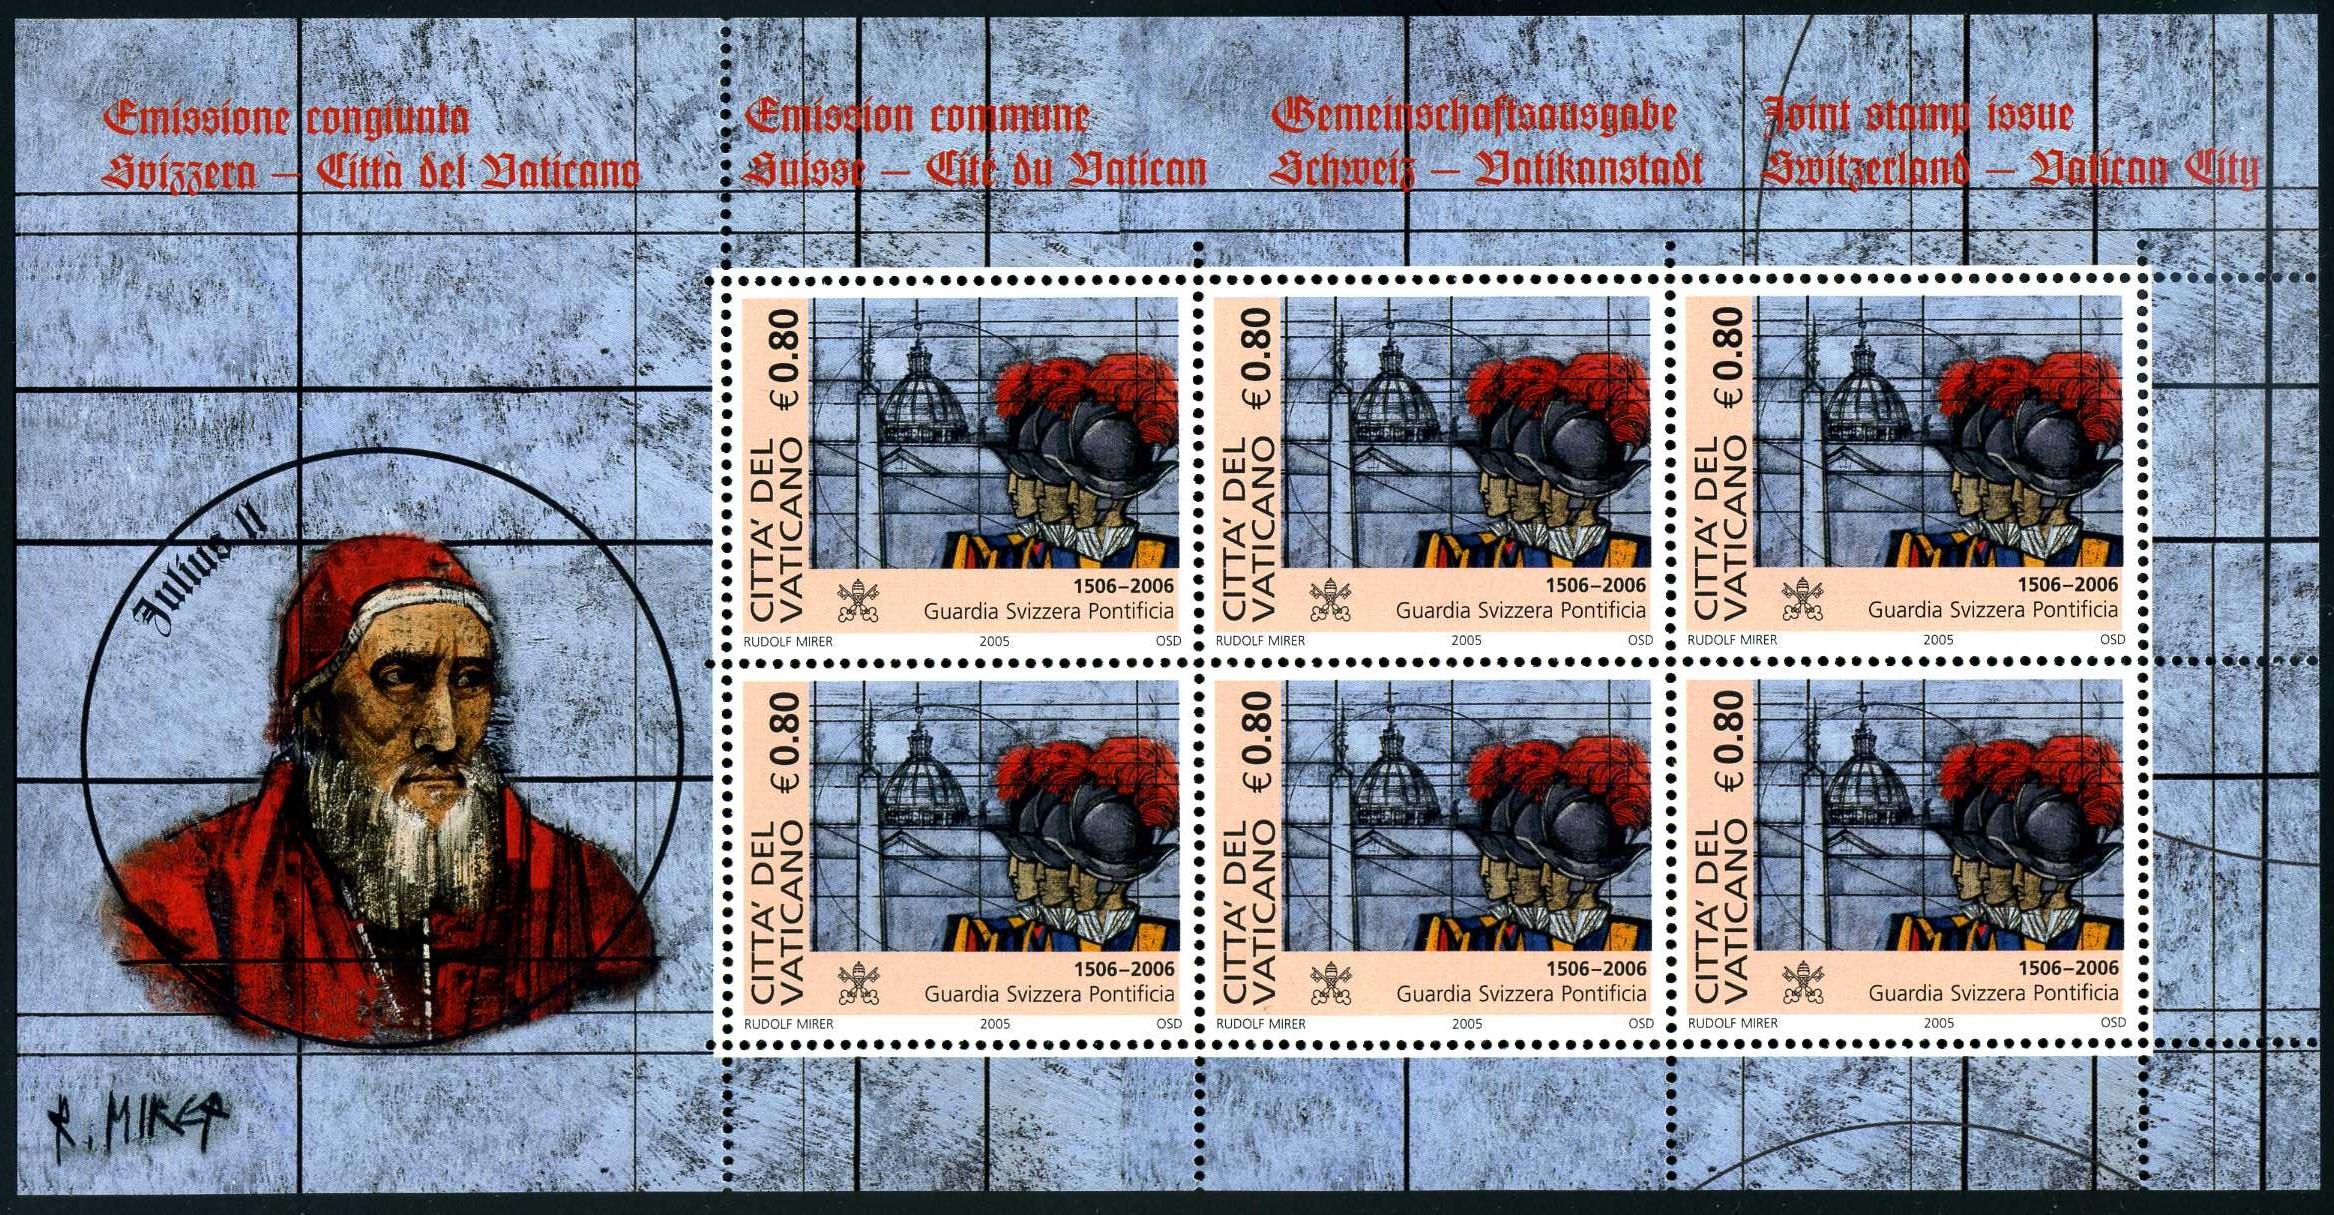 VA 021 2006 Schweizer Garde Block 0,80.jpg